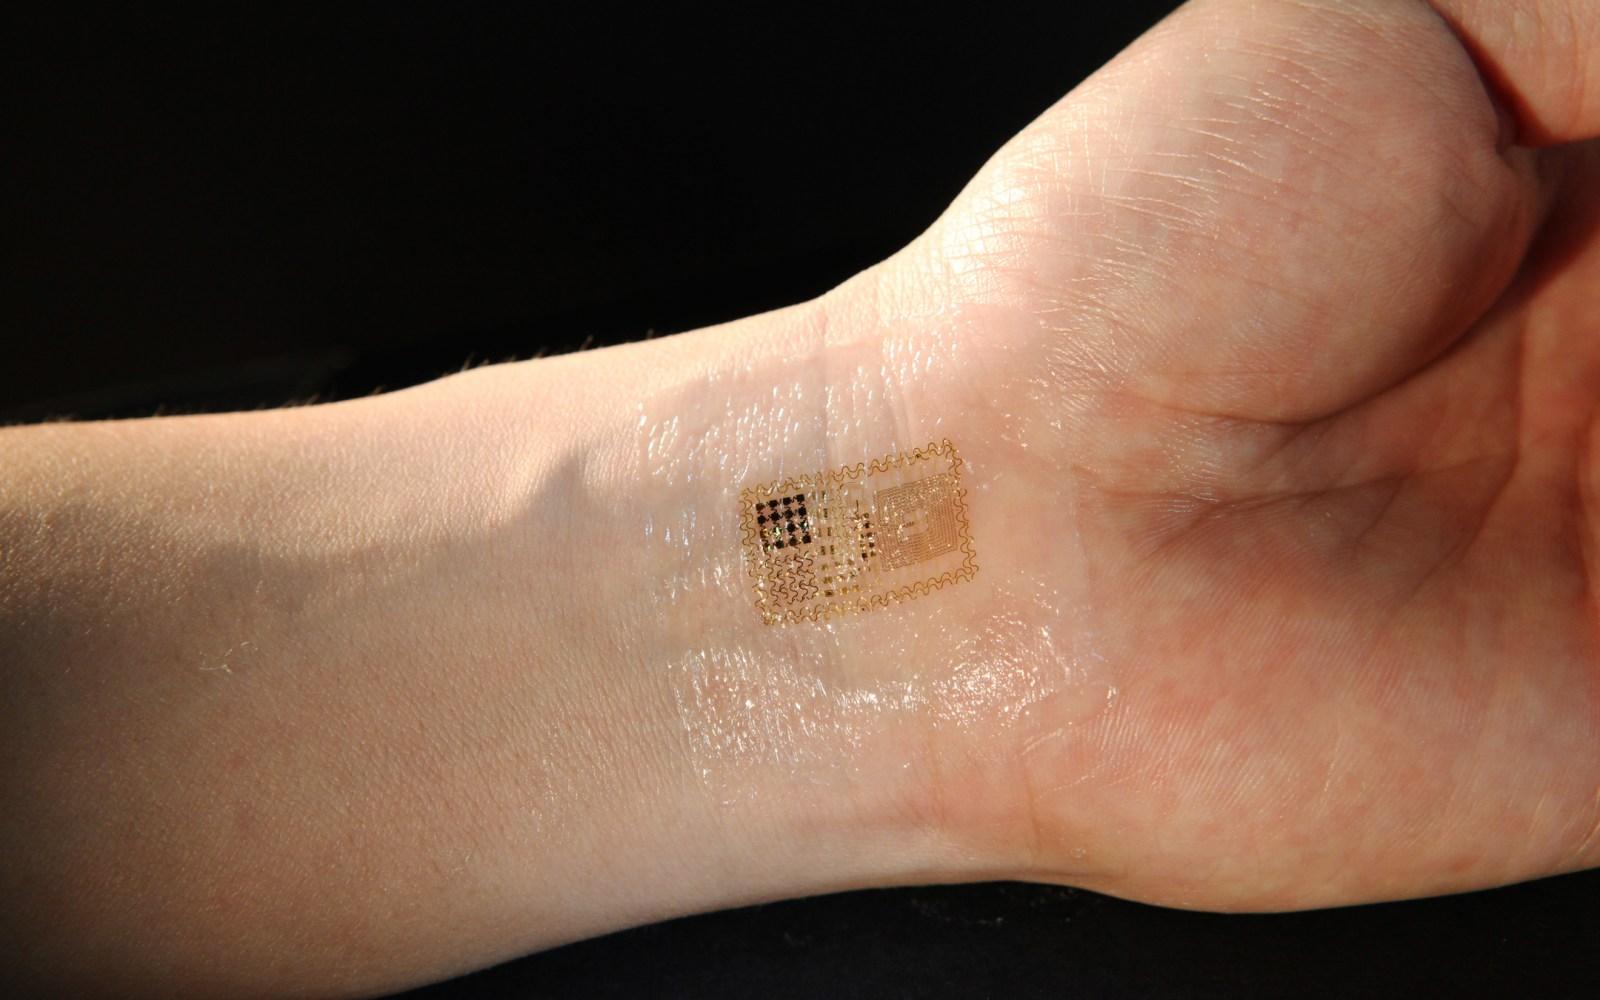 Apple continues hiring raid on medical sensor field as it develops eye scanning technology